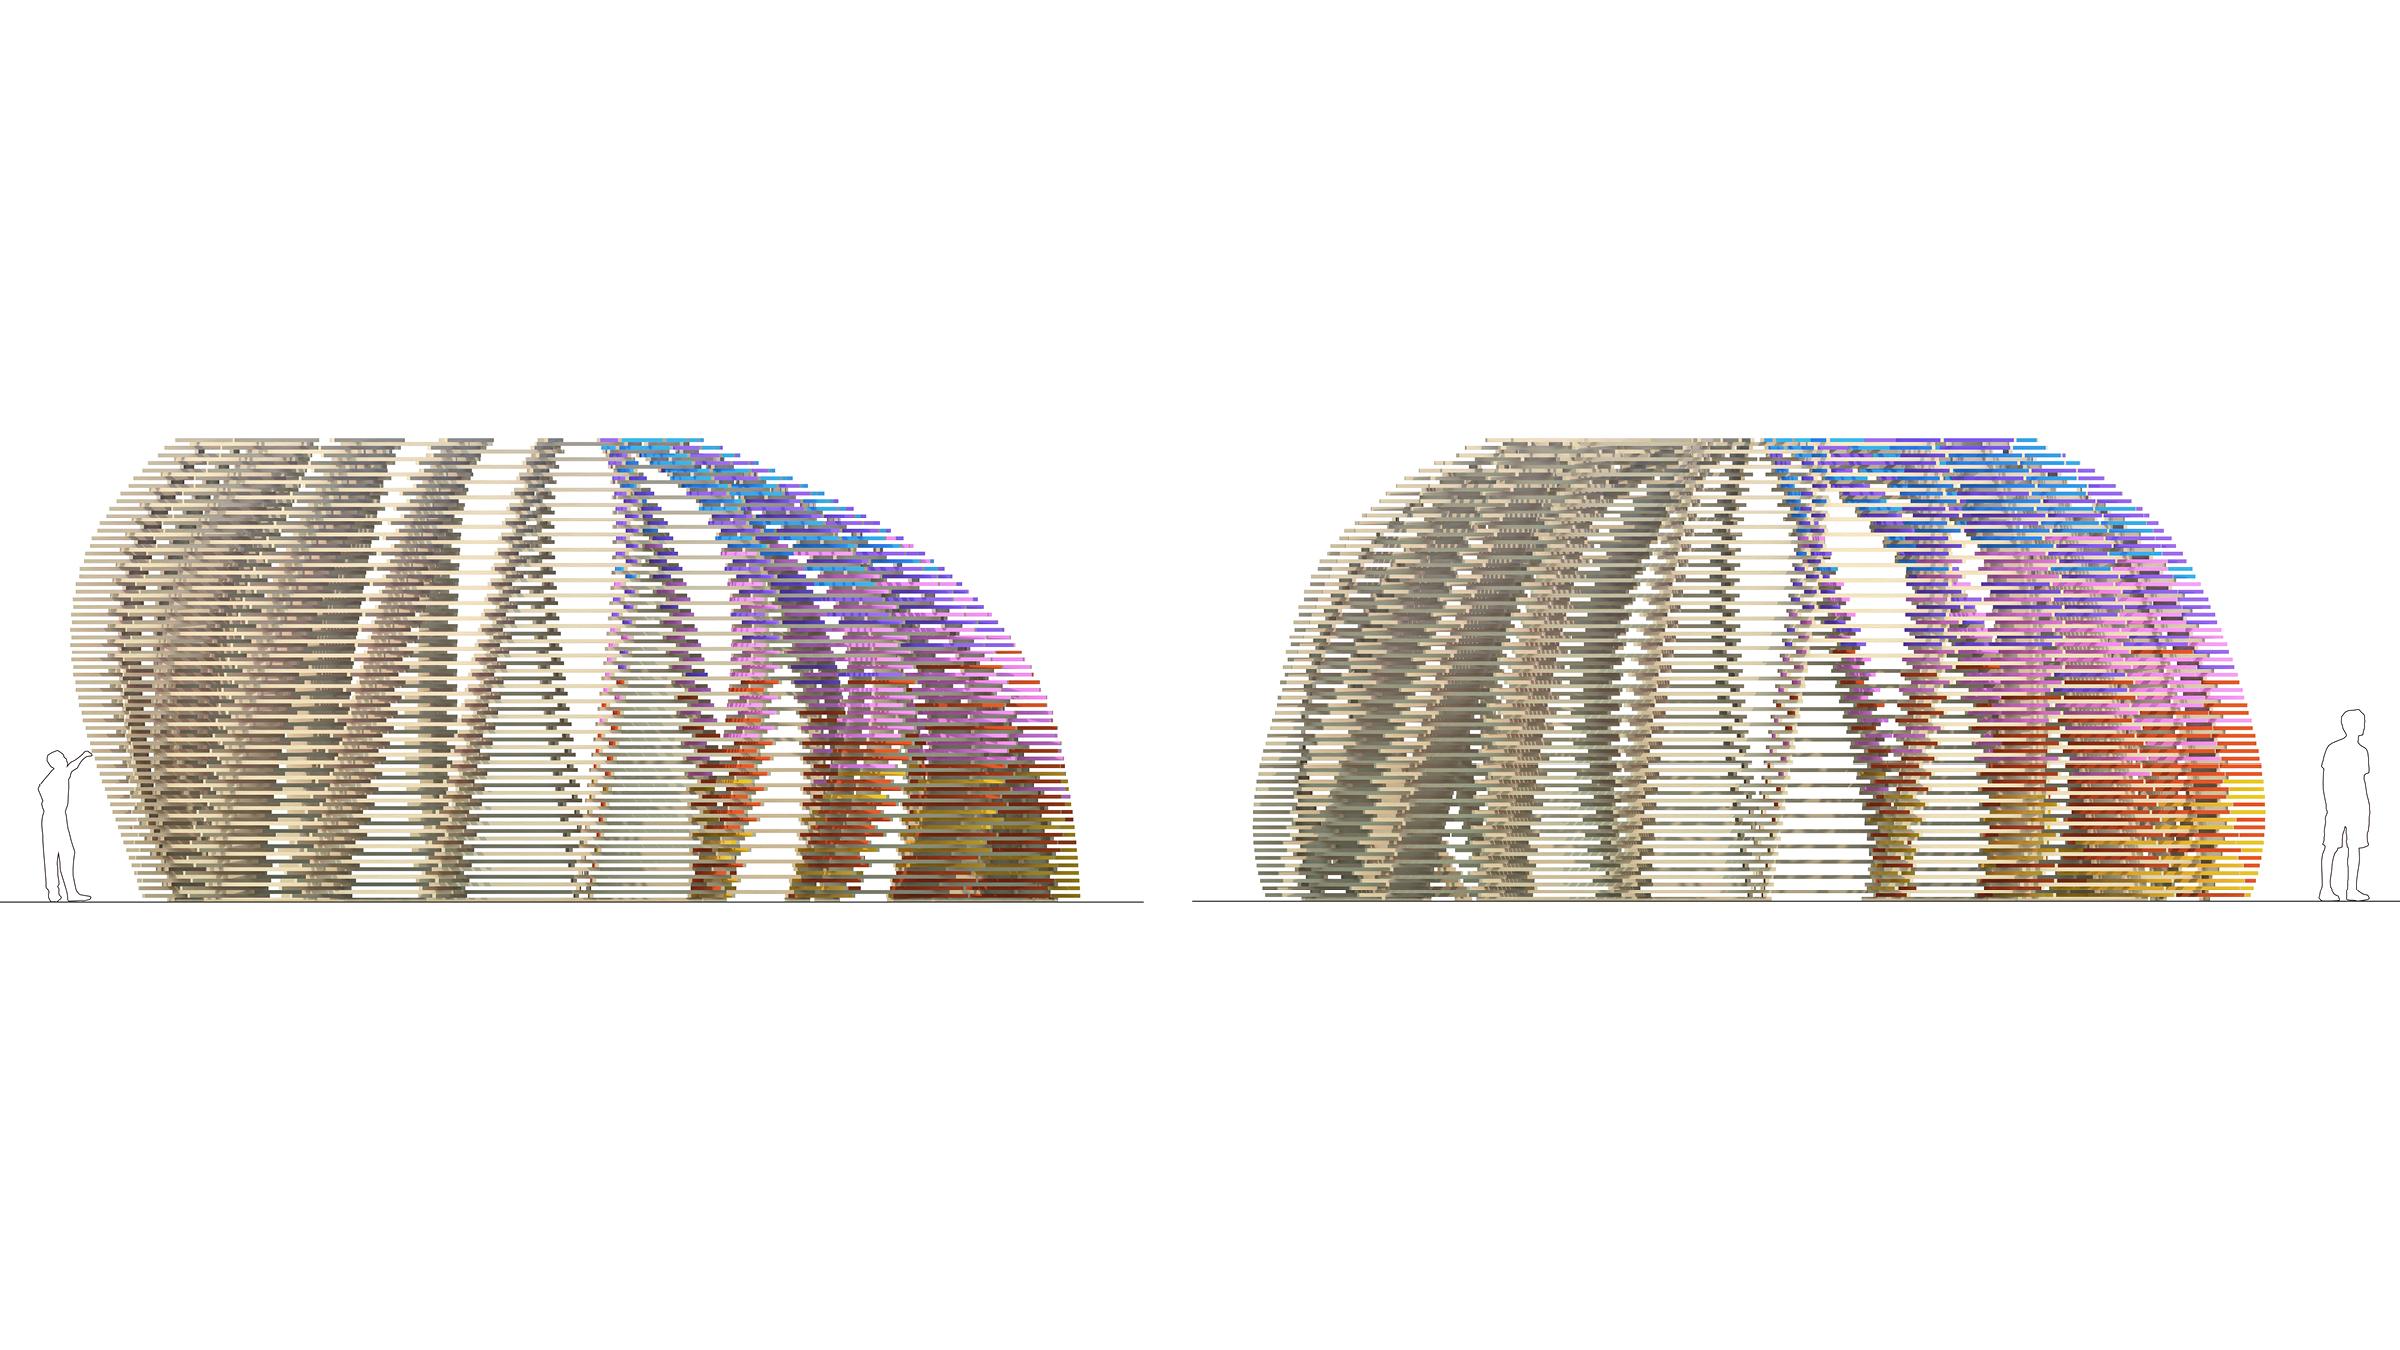 chrysalis images5.jpg